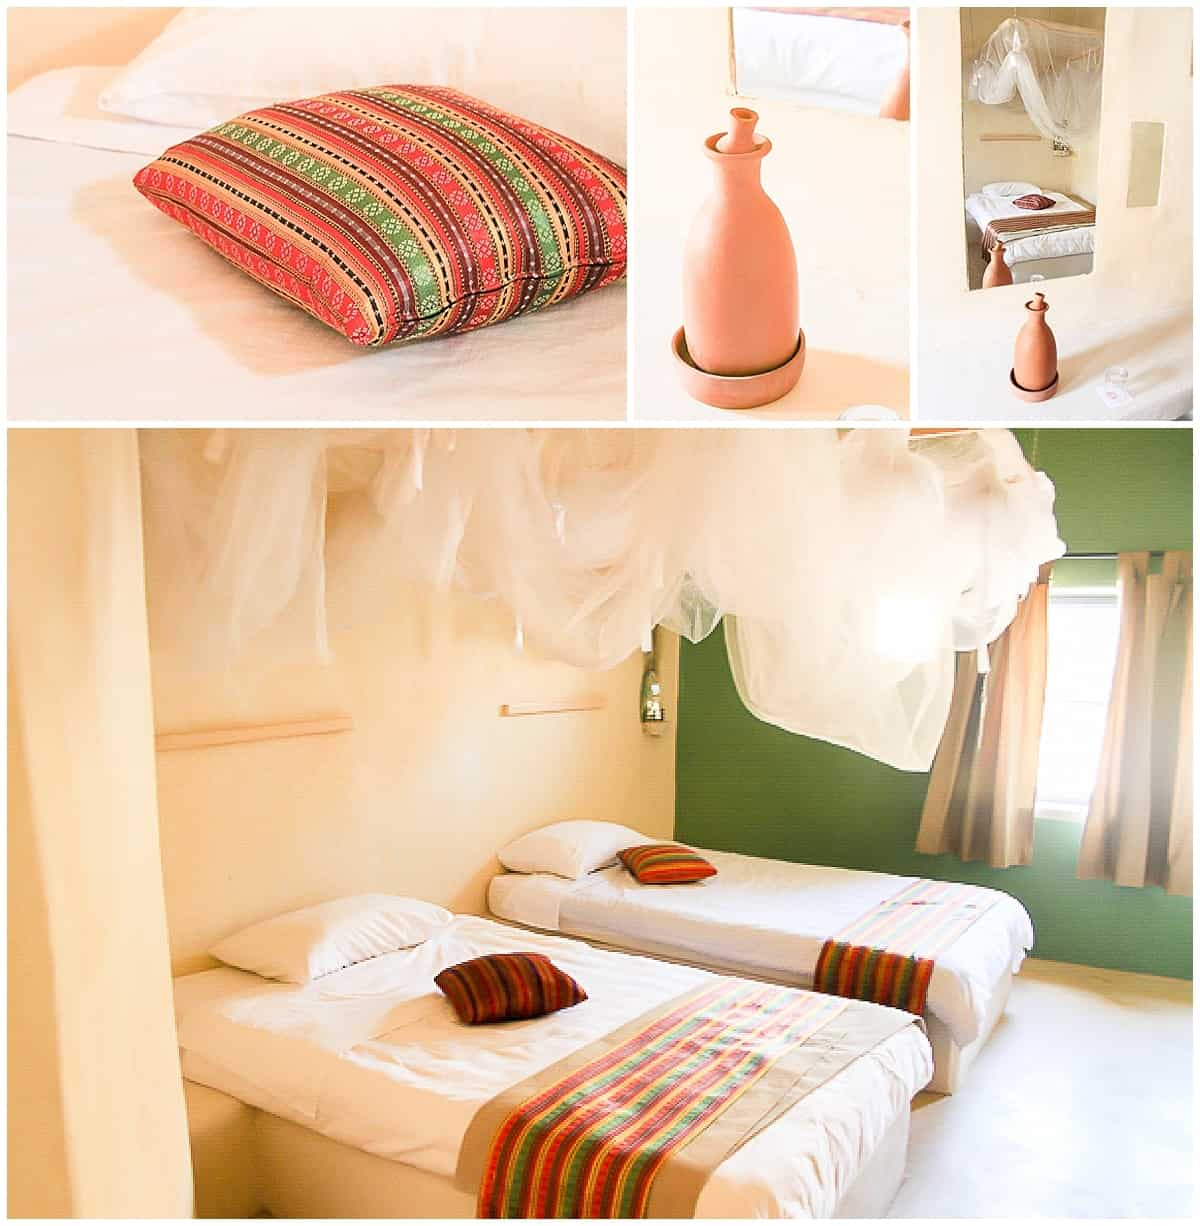 Rooms at the Feynan Ecolodge in Jordan